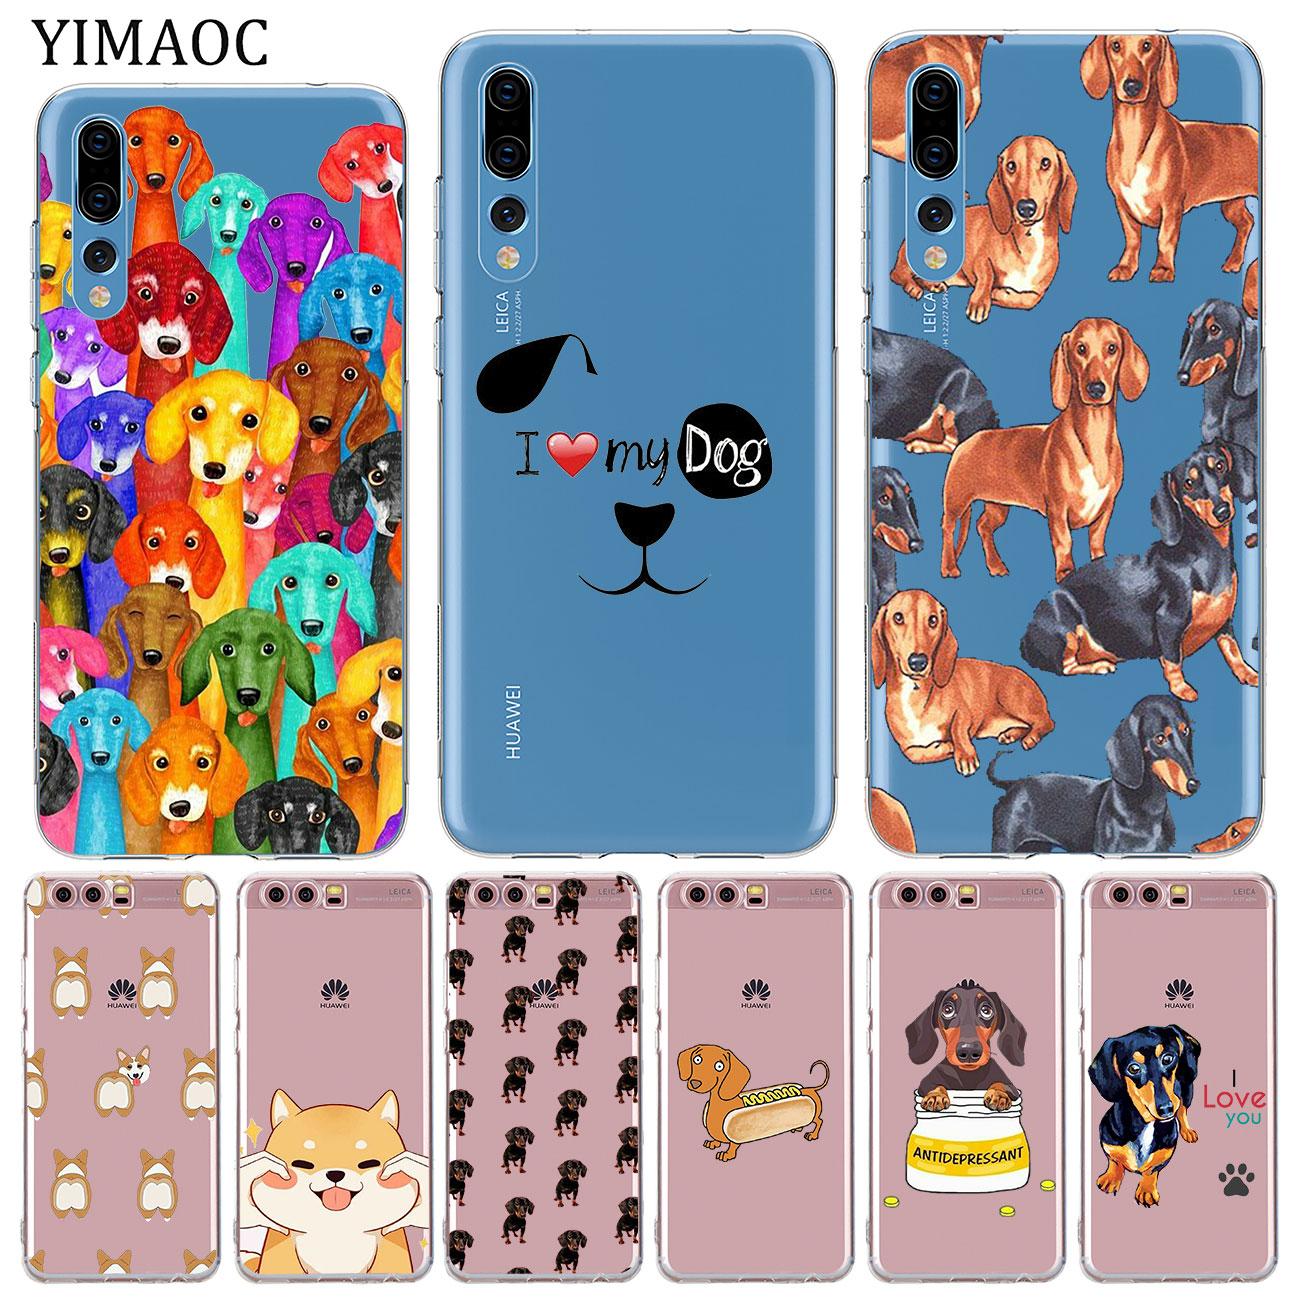 YIMAOC Dachshund cute dog Soft Silicone tpu Phone Case for Huawei Mate 30 20 Pro 10 Lite Nova 5I 4 3